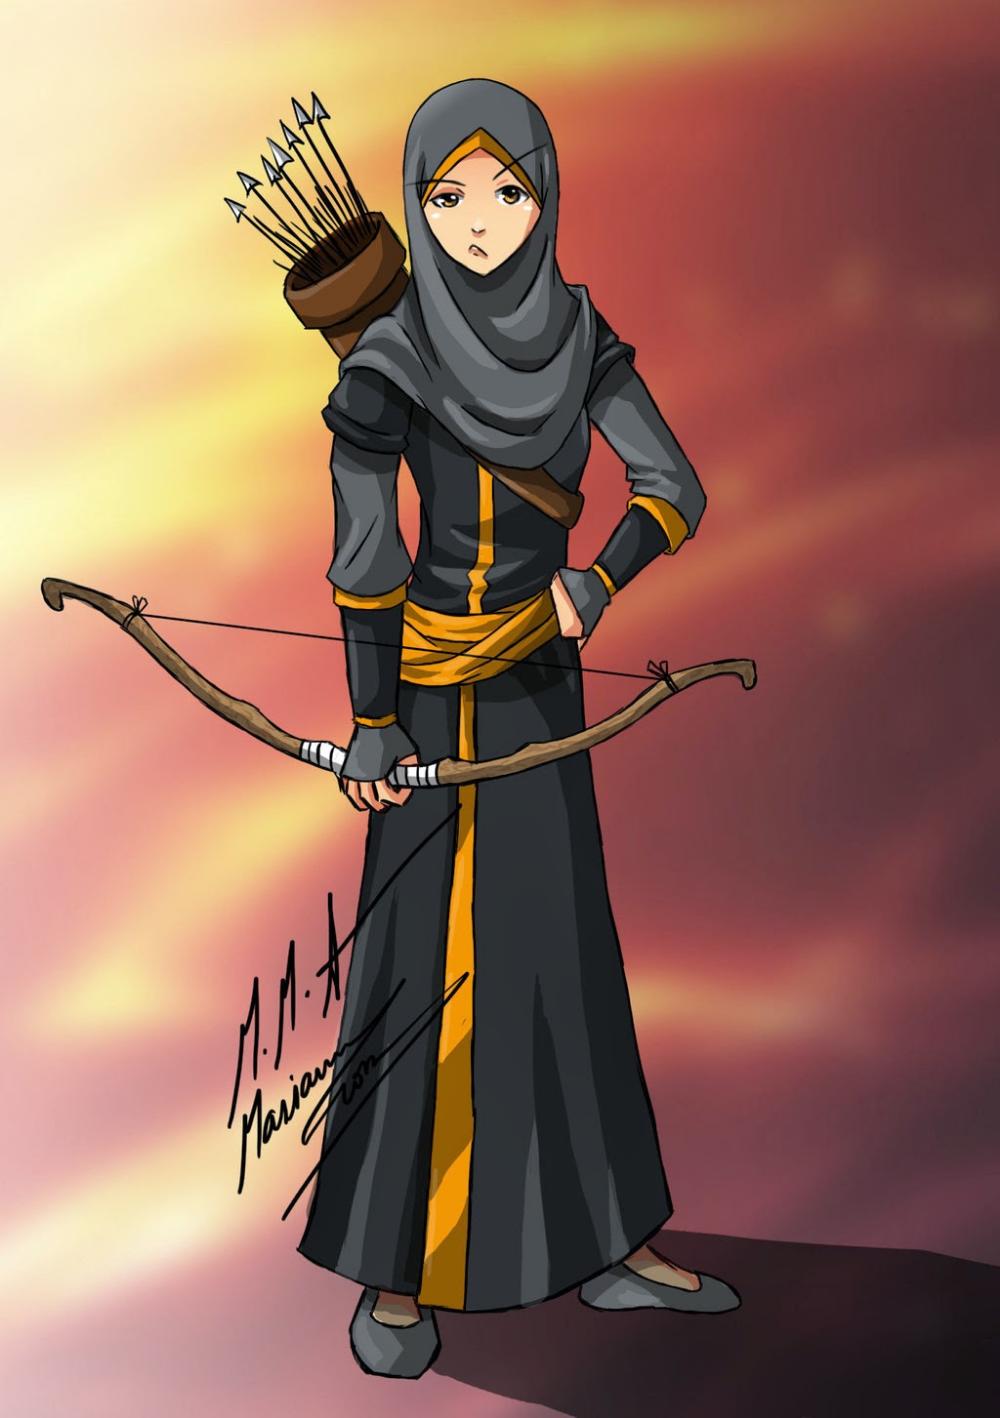 Koleksi Gambar Kartun Ana Muslim Dan Muslimah Infokini Anime Muslimah Anime Muslim Hijab Cartoon